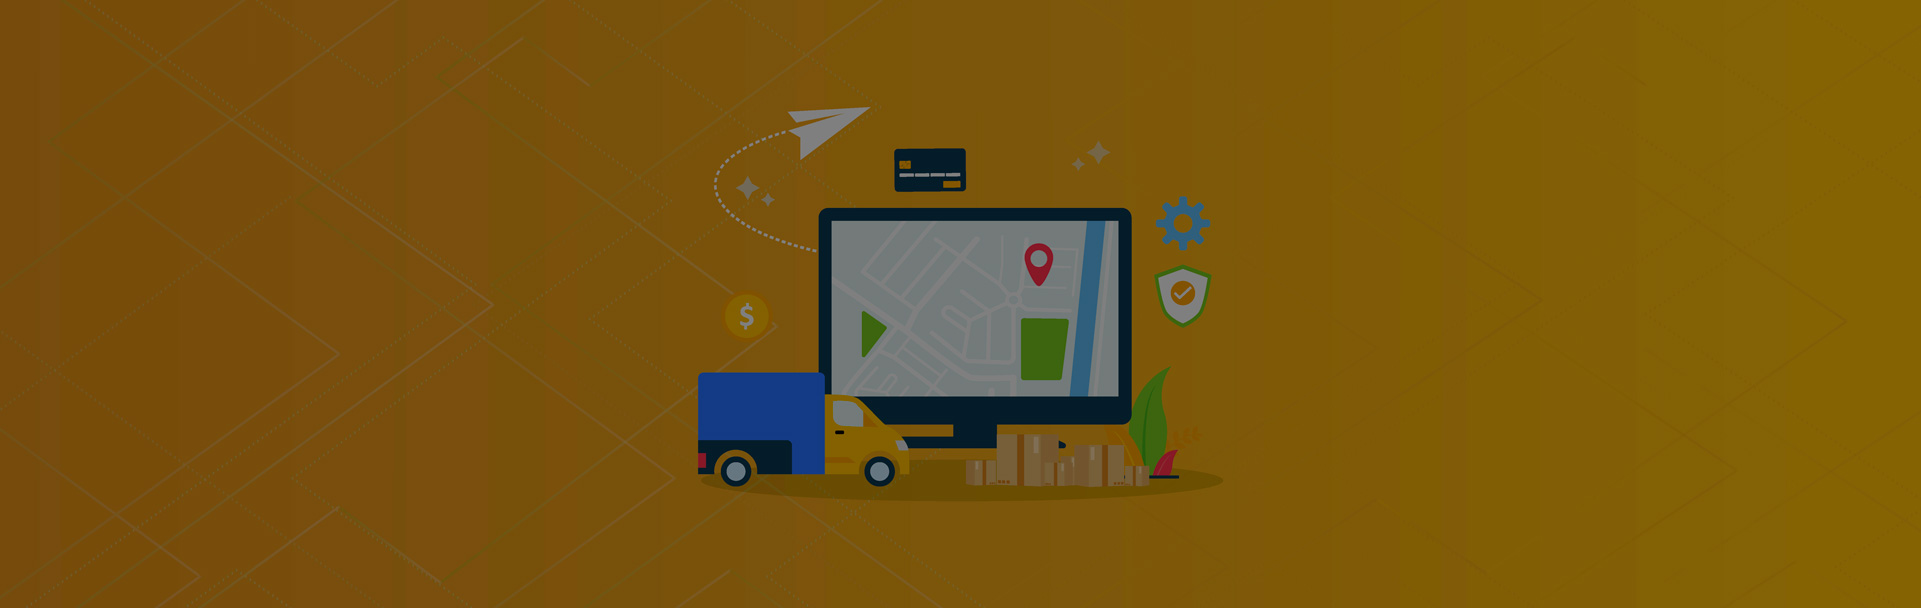 Blog-Solucionweb-Visual-search-ecommerce-03